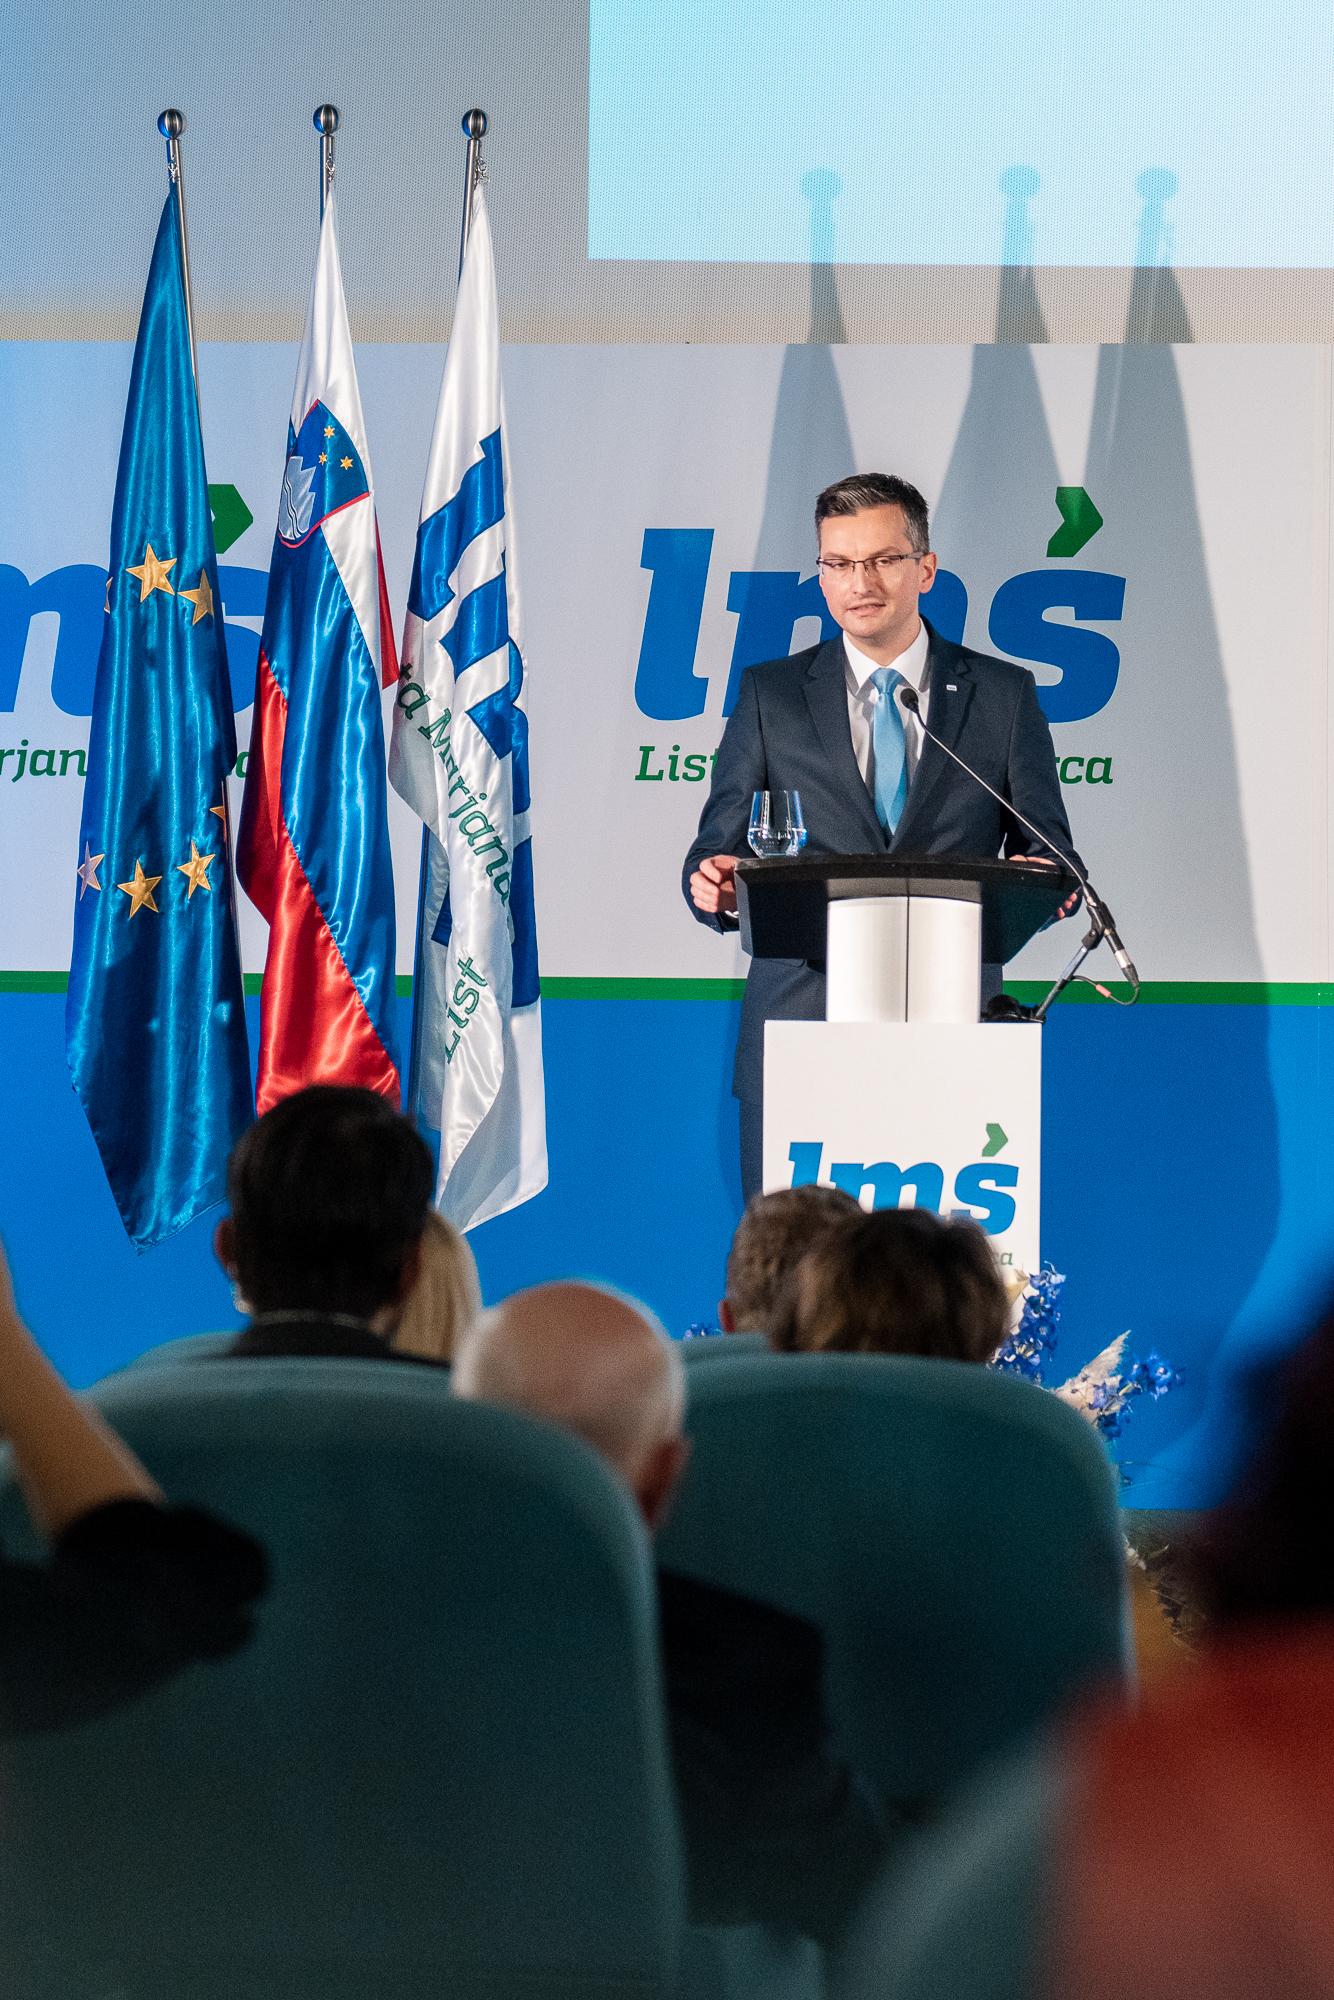 Marjan Šarec, Prime Minister of Slovenia and president of Lista Marjana Šarca, on the stage at the Fifth Congres of Lista Marjana Šarca in Trbovlje, Slovenia